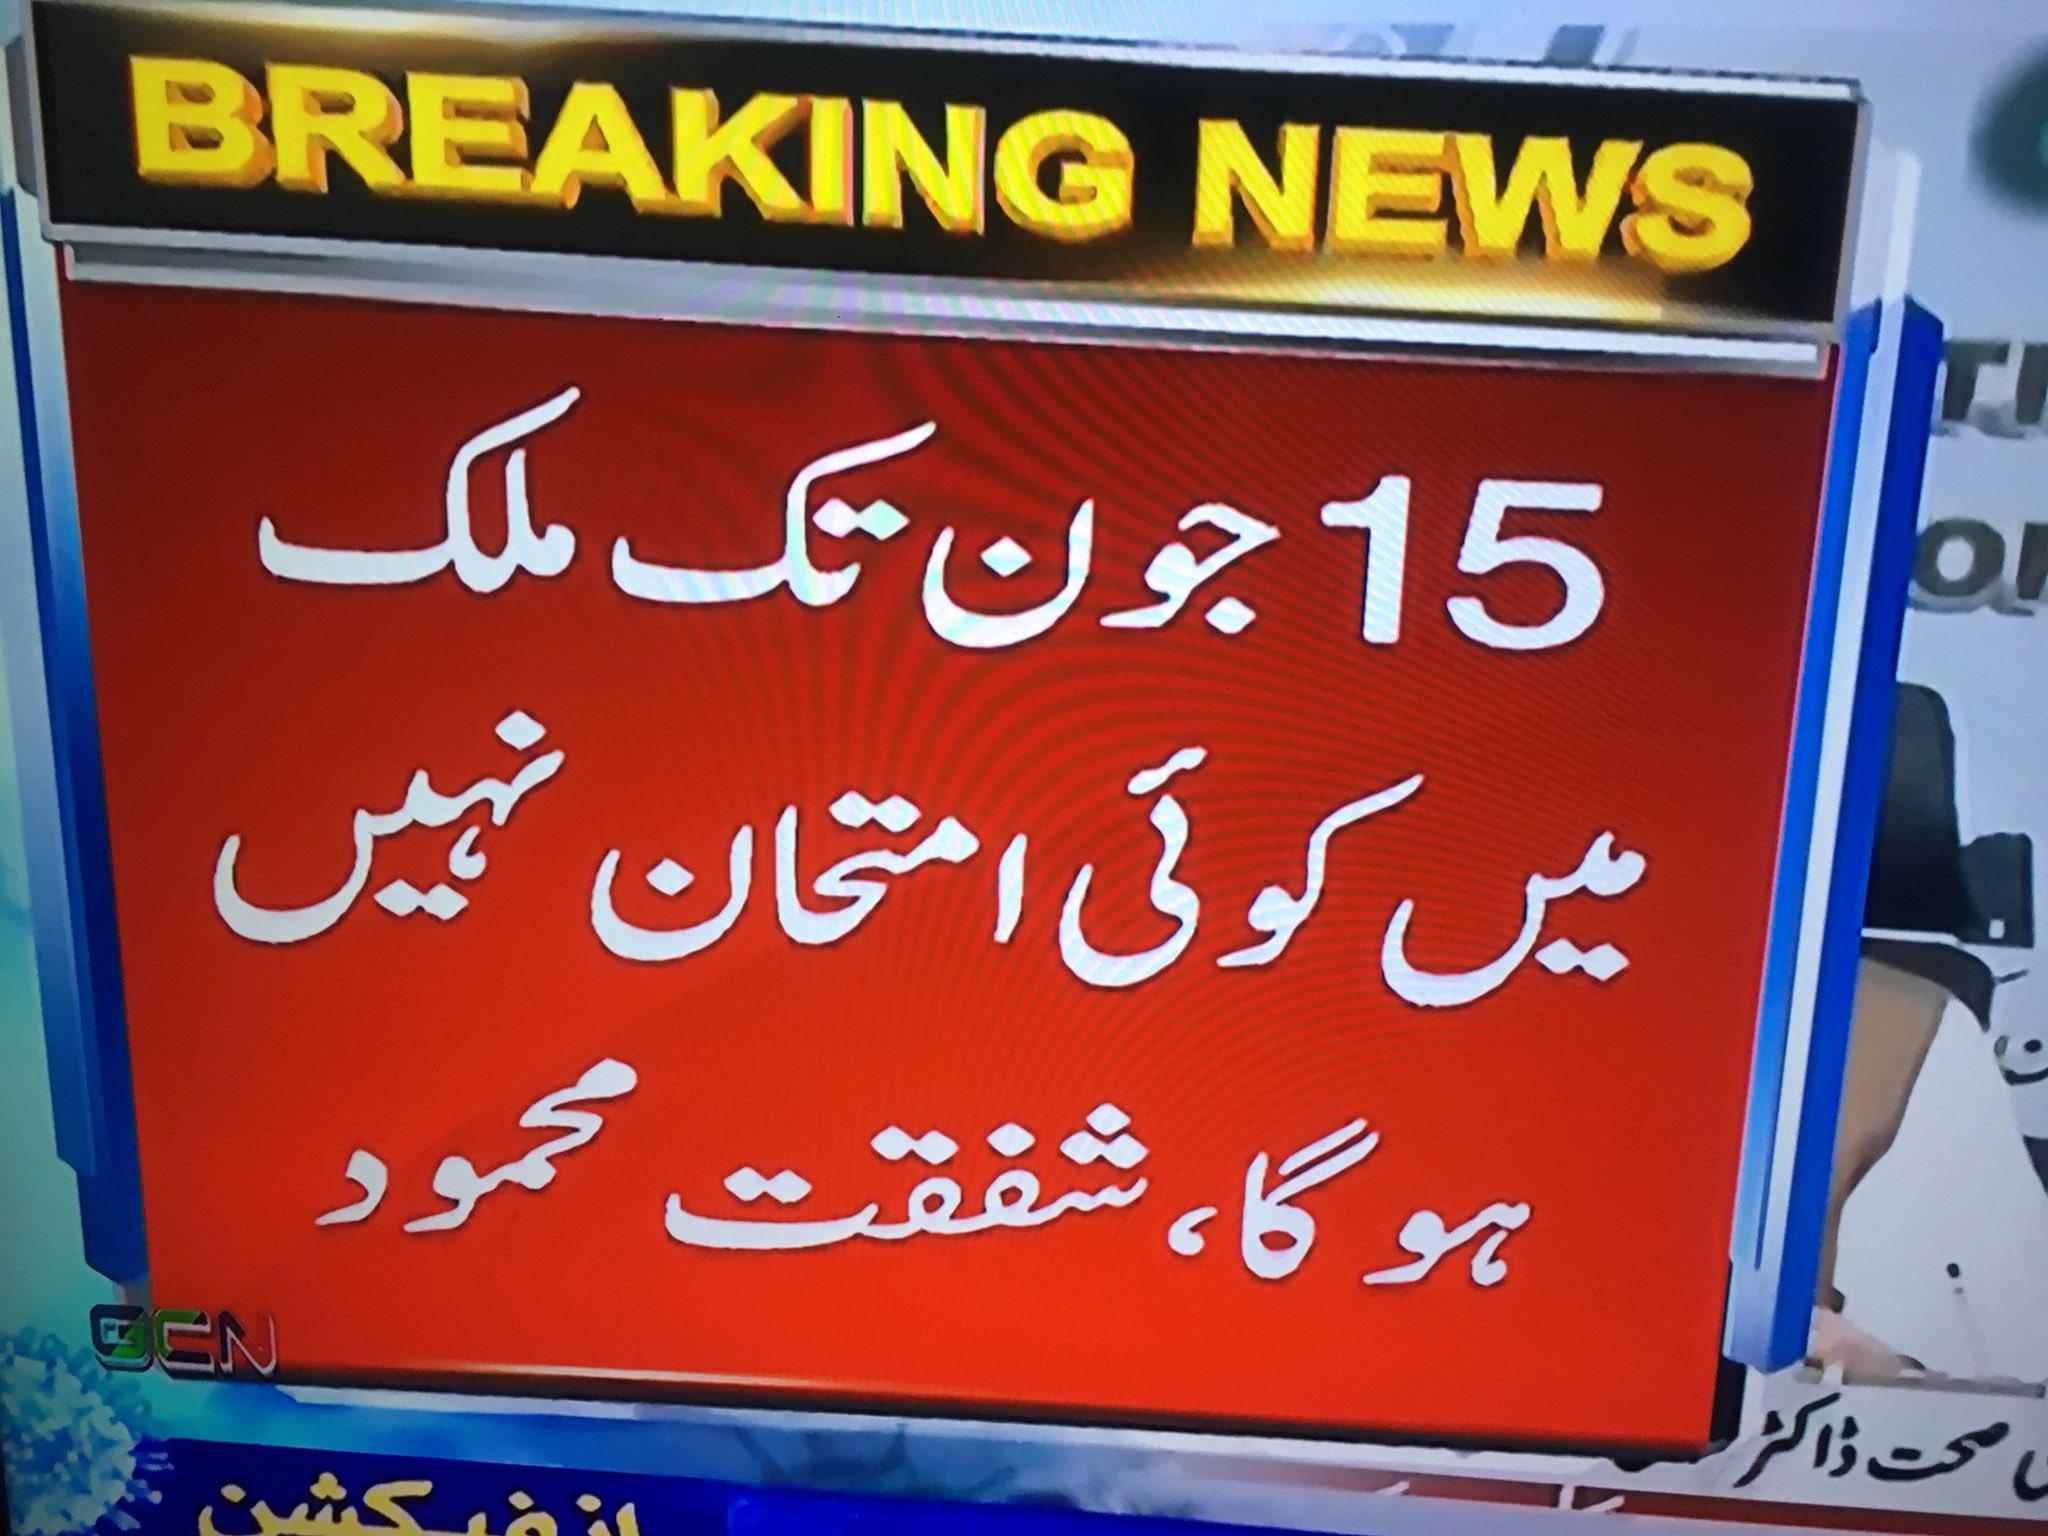 All exams in Pakistan postponed till 15th June, says Education Minister Shafqat Mehmood